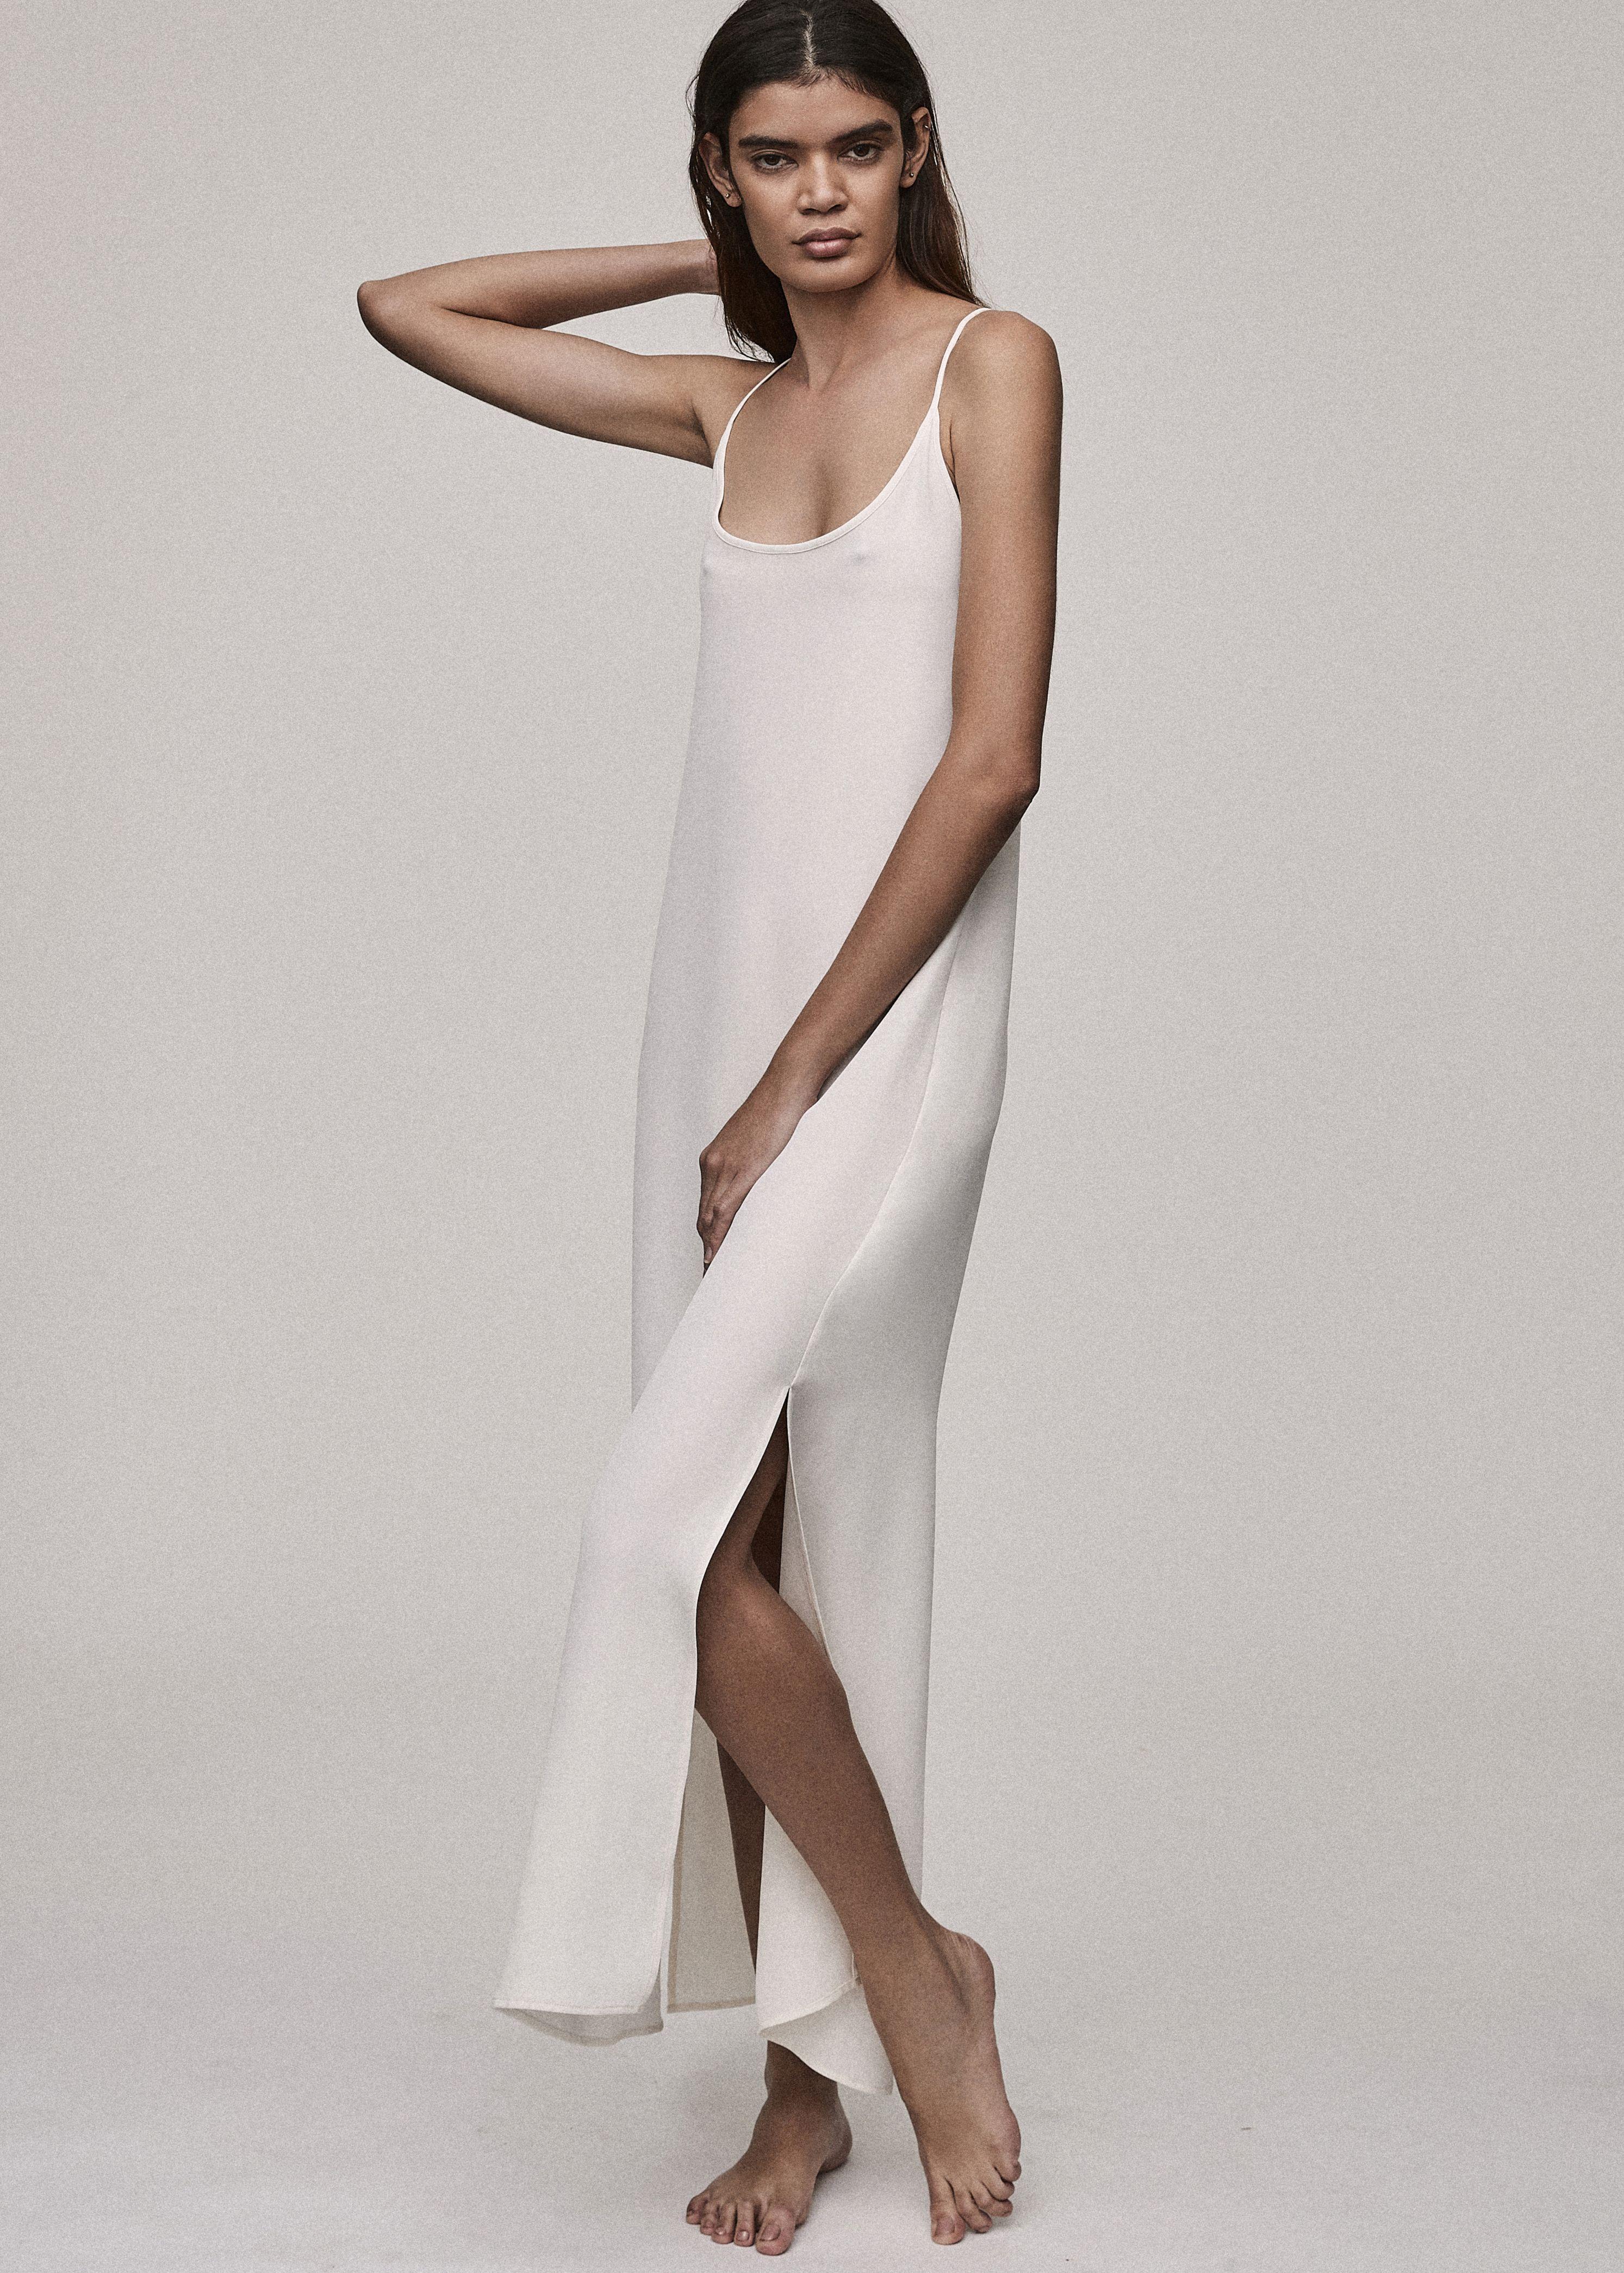 Asceno White Silk Long Slip Dress Bridal Edit Long Slip Dress Silk Dress Long Slip Dress [ 4181 x 2987 Pixel ]